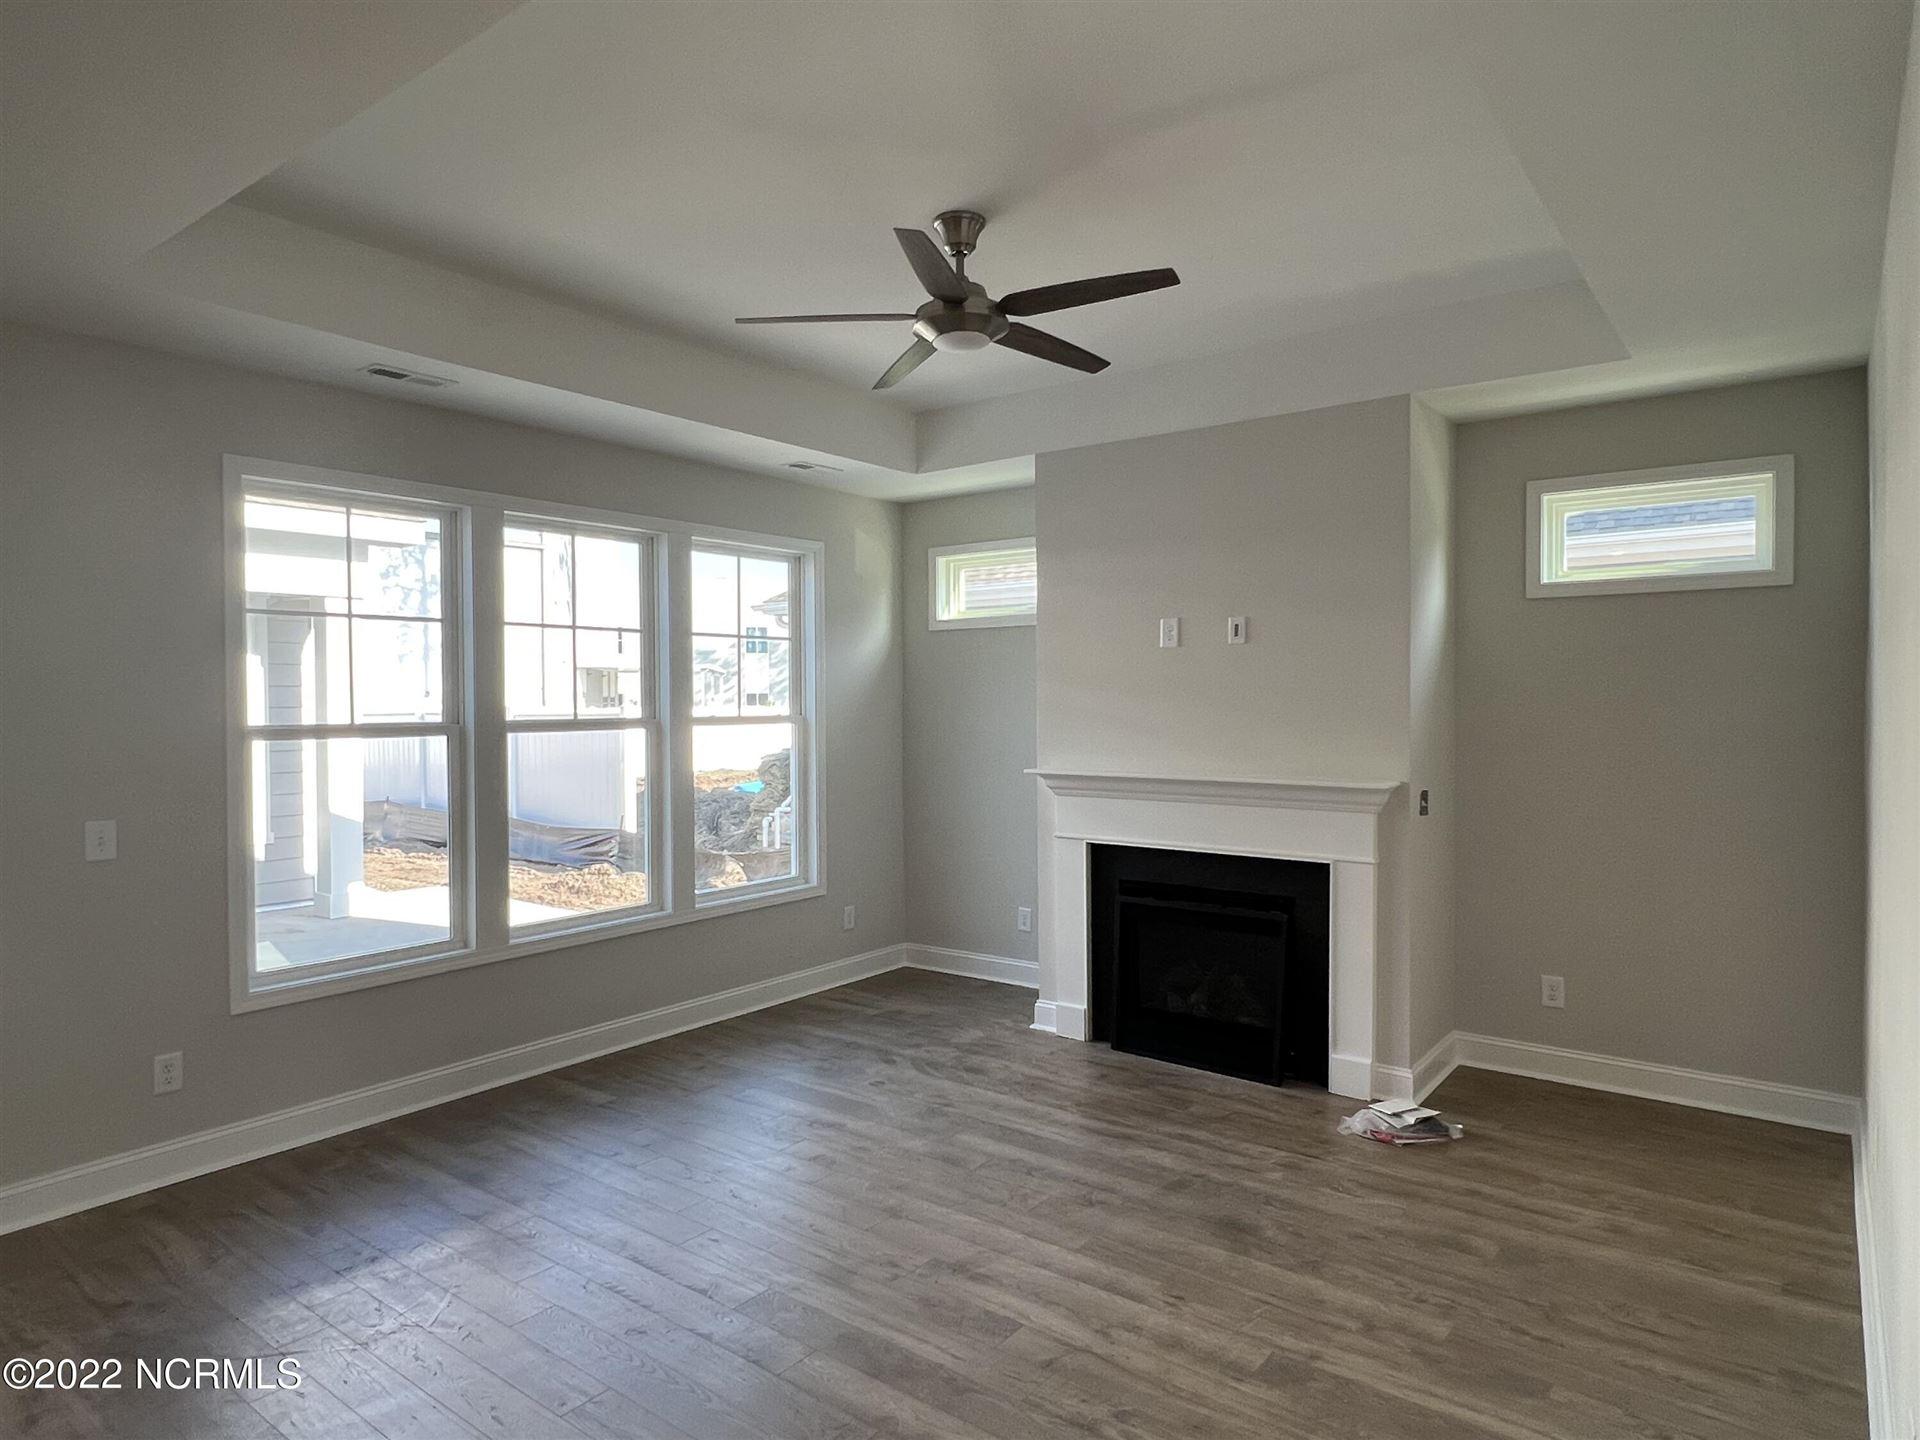 Photo of 8925 Cobble Ridge Drive, Wilmington, NC 28411 (MLS # 100280756)